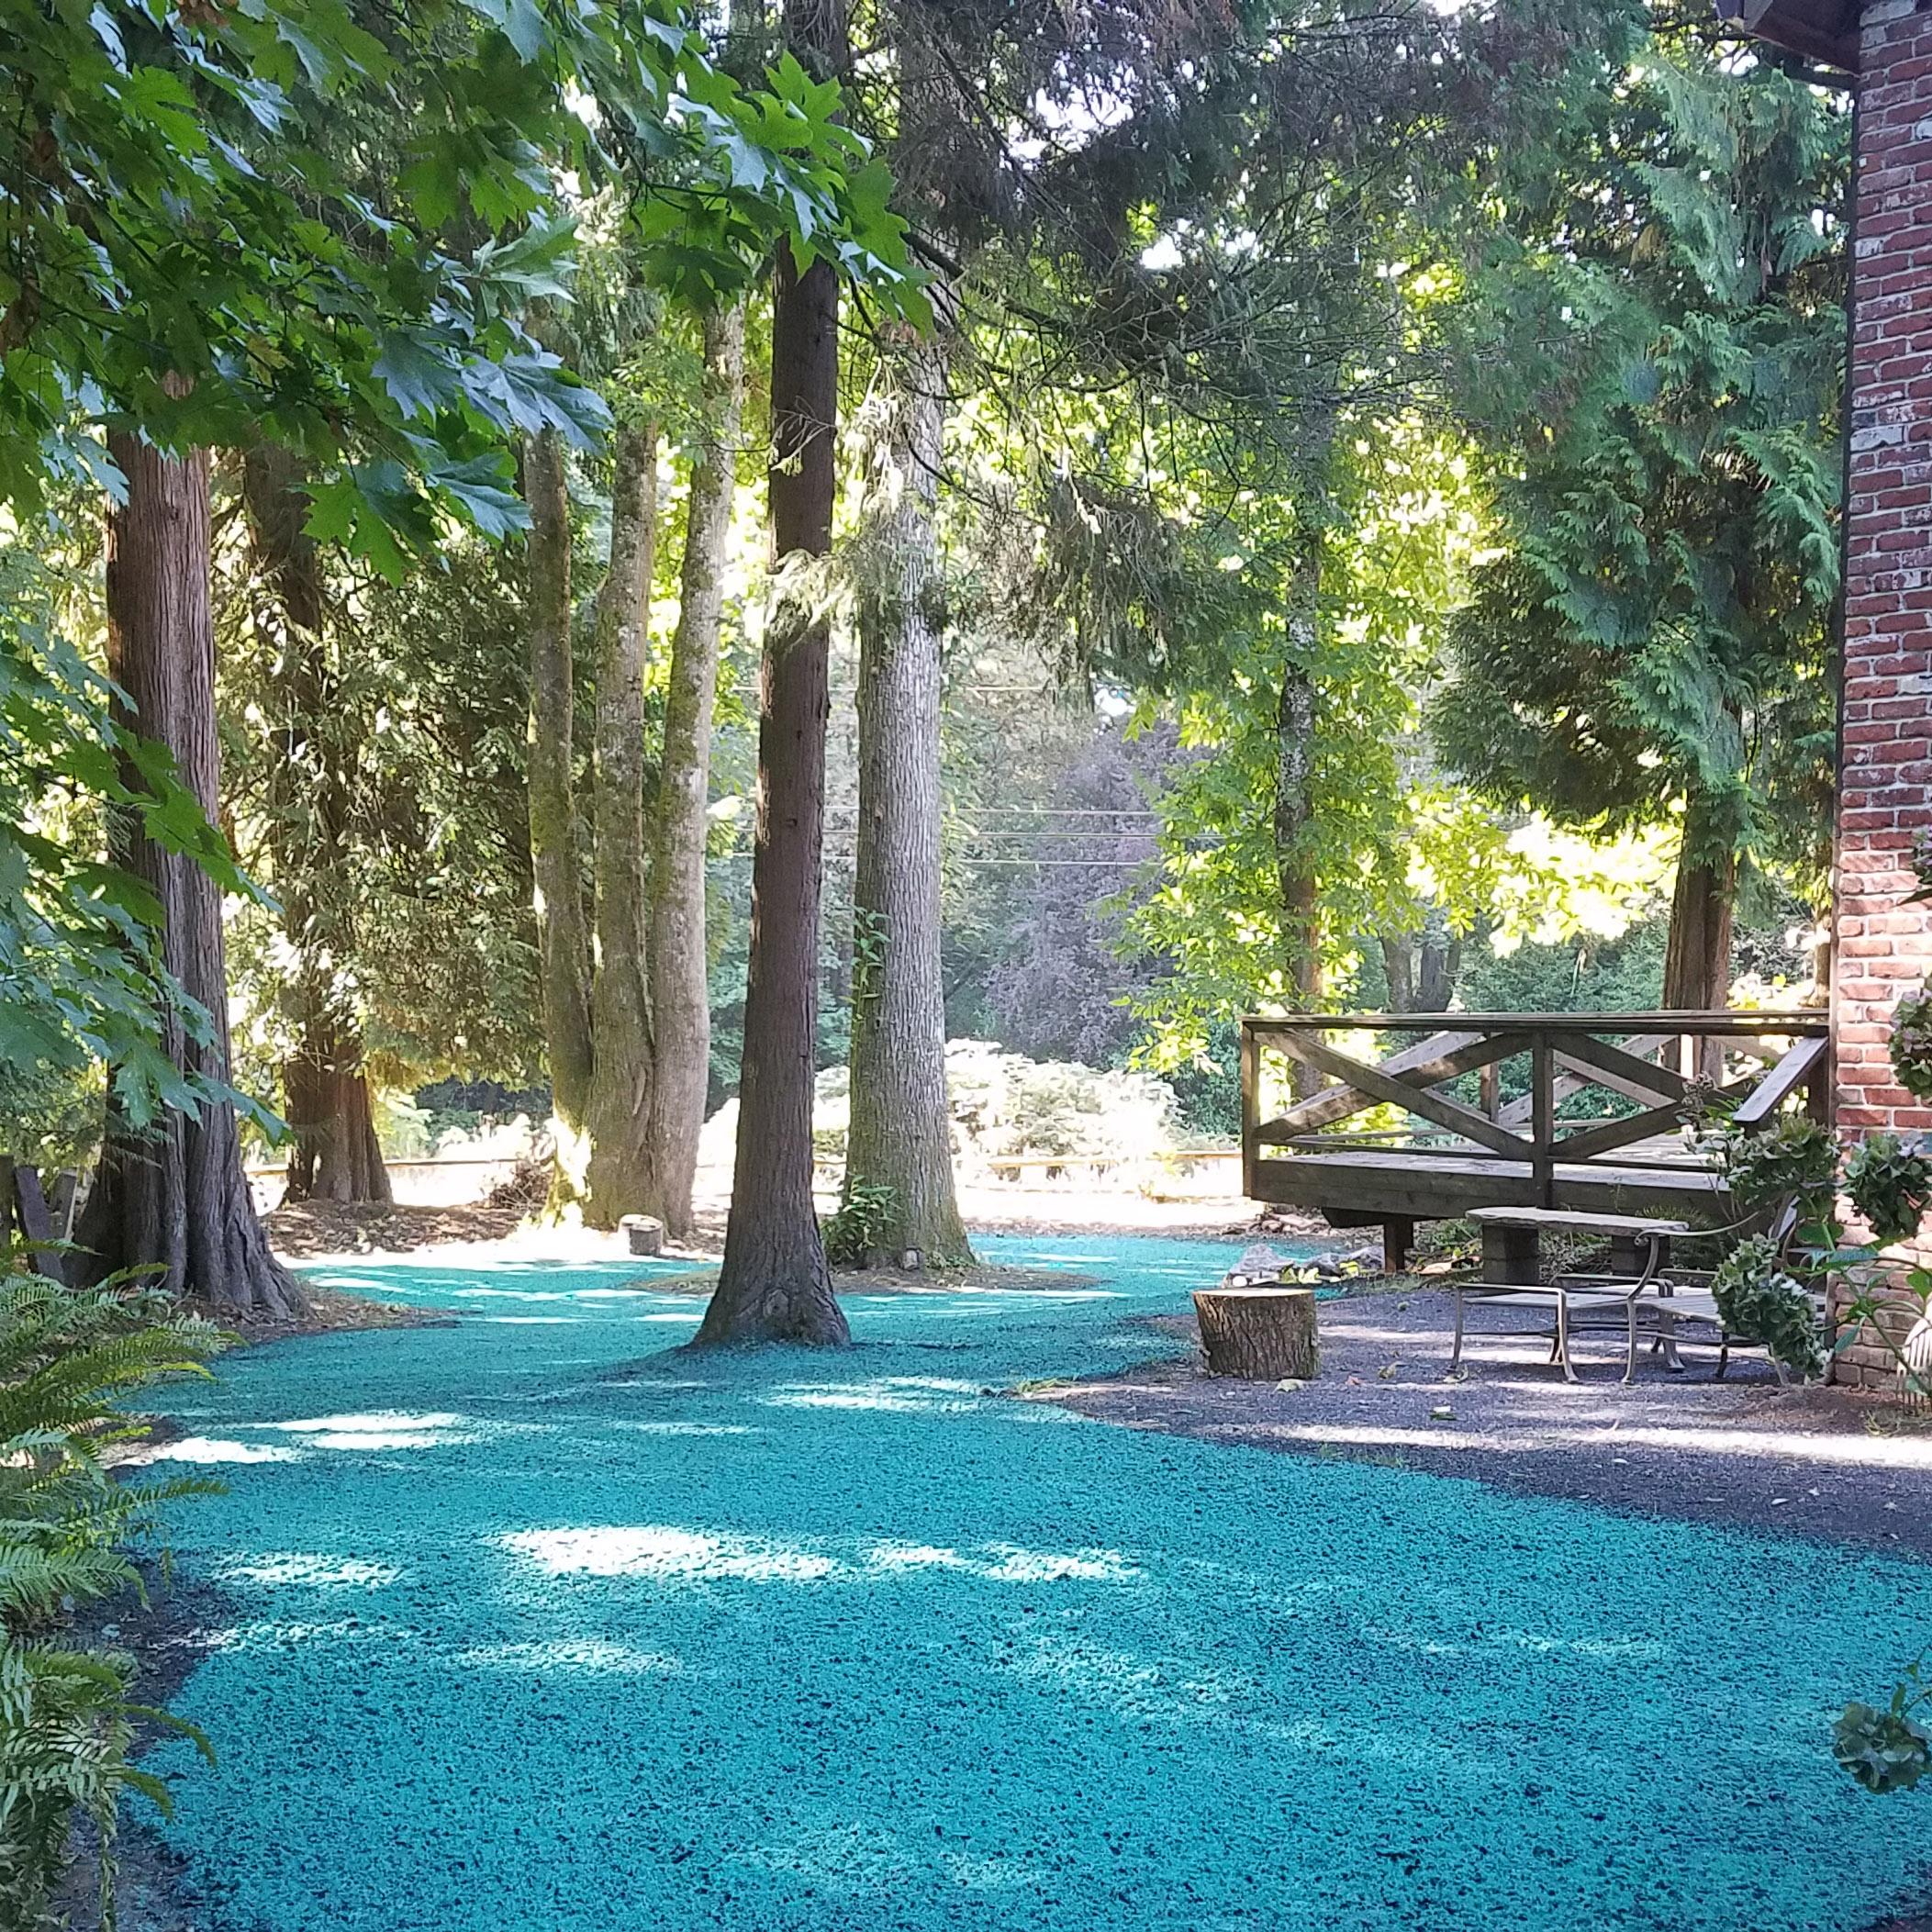 Hydroseed lawn repair in treed area